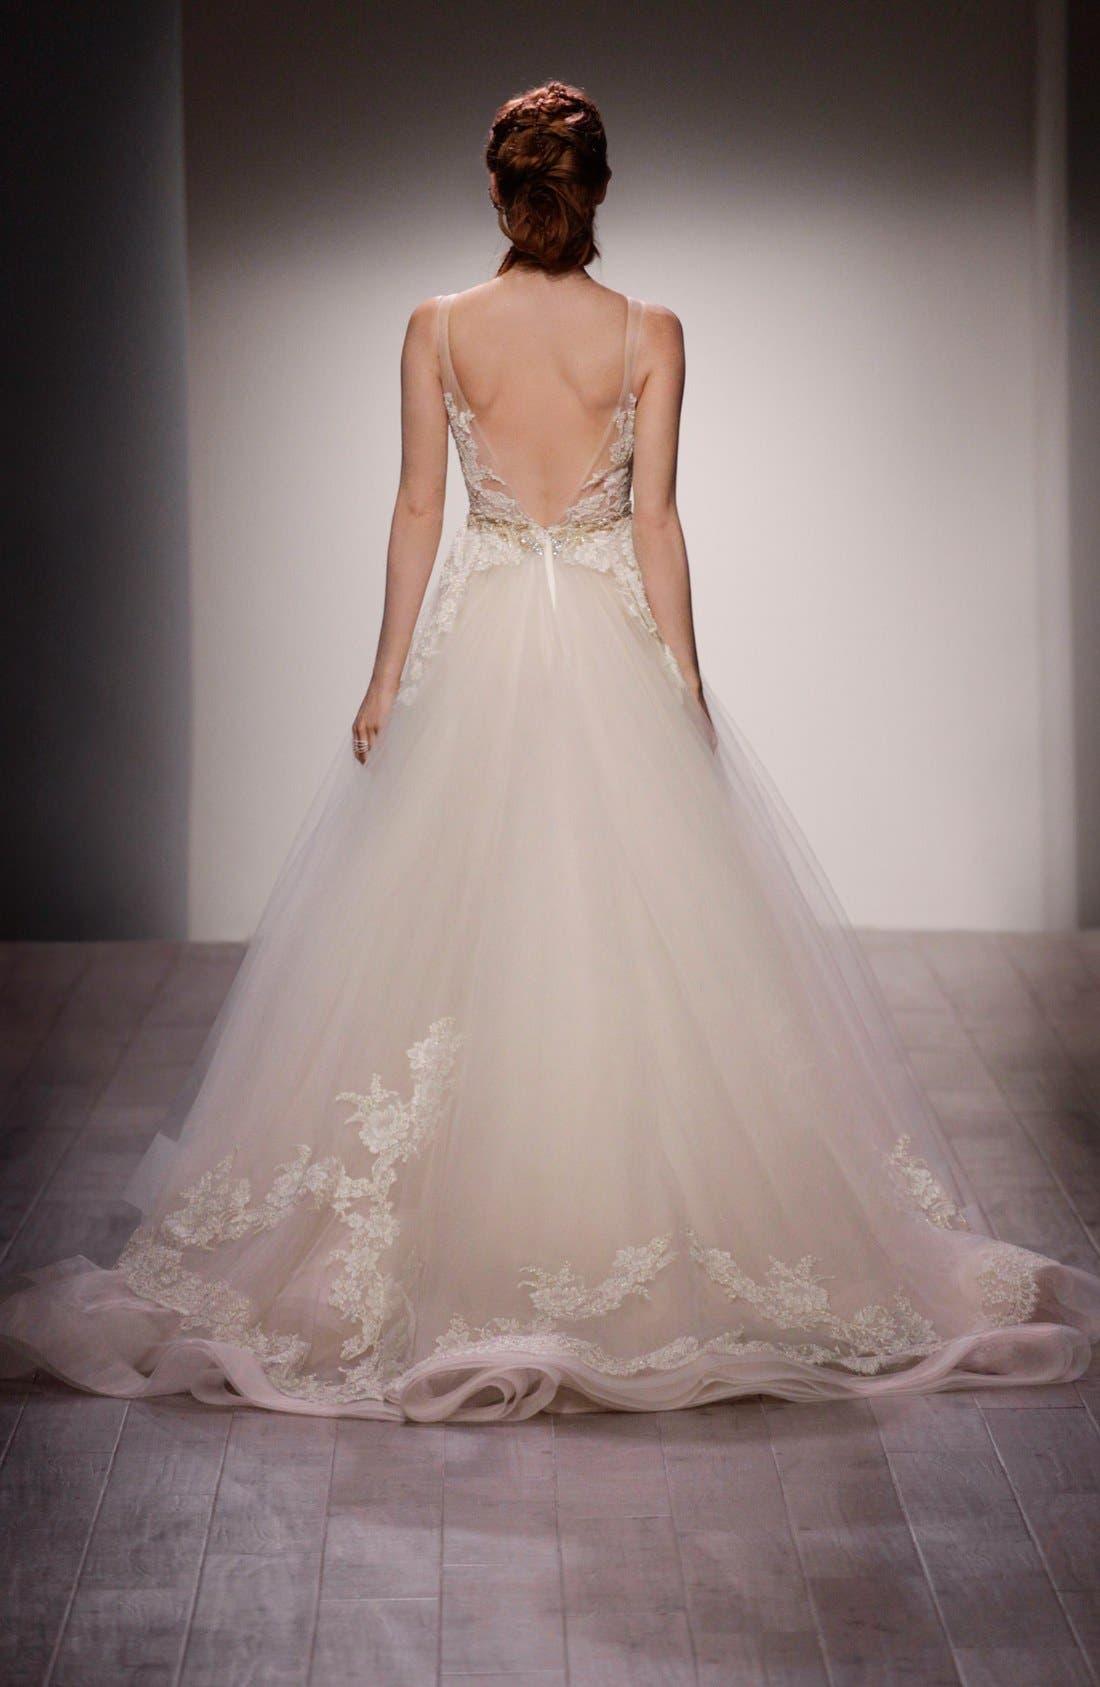 Lace Appliqué Tulle Ballgown Dress,                             Alternate thumbnail 2, color,                             Ivory/Gold/Champagne